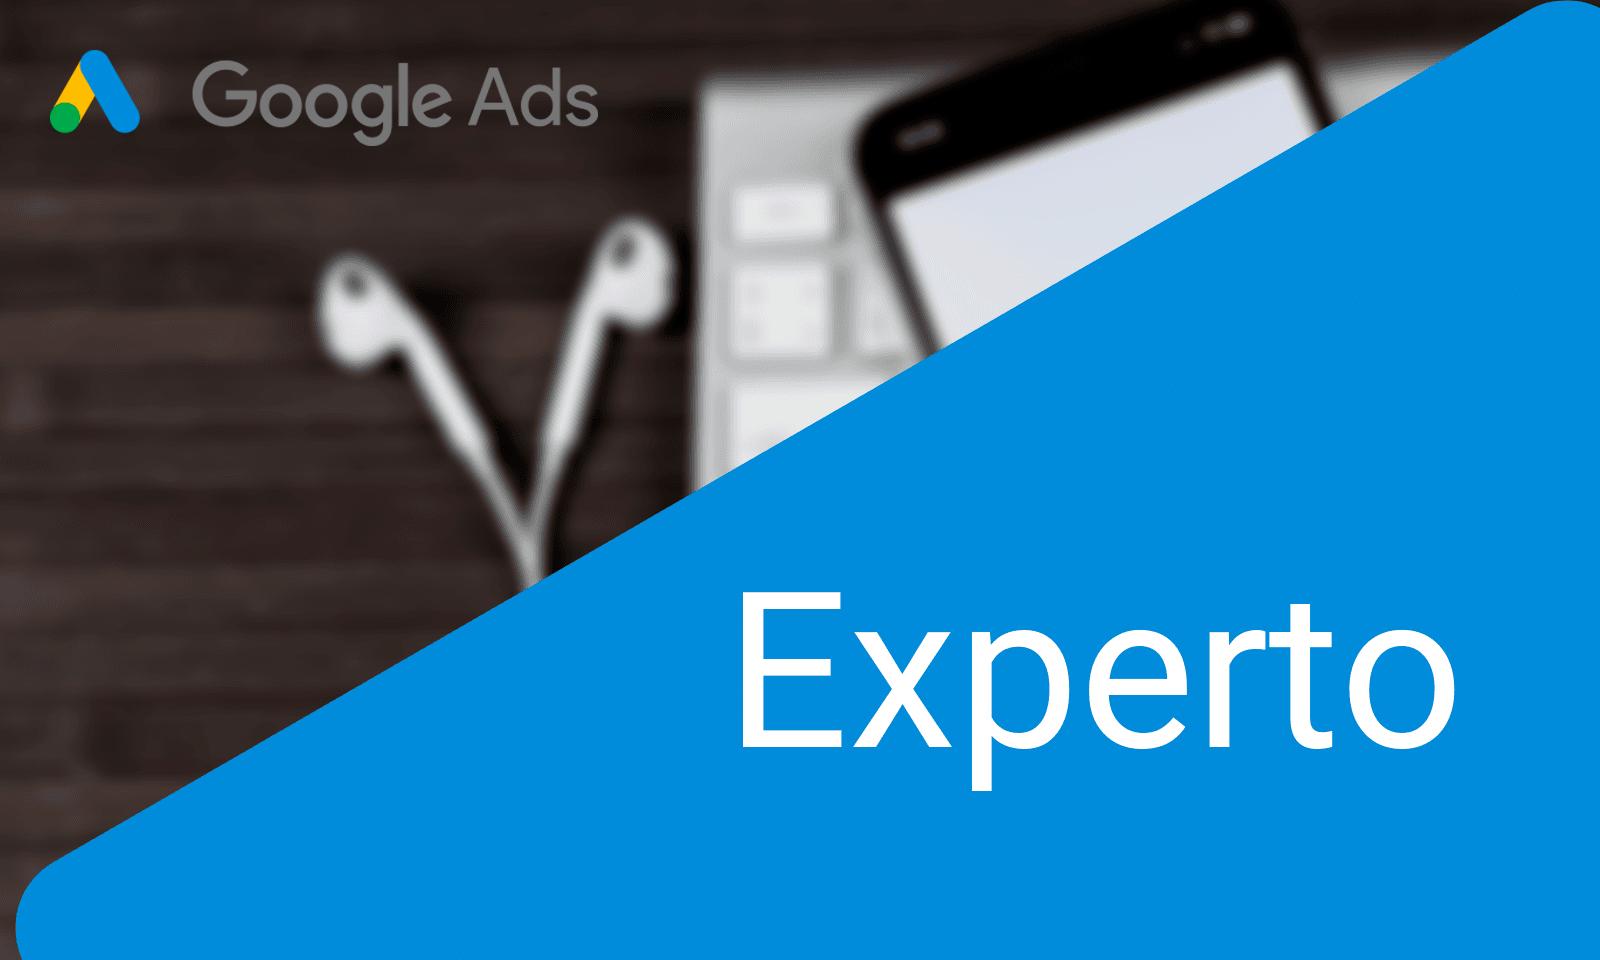 Inteligenzia - Curso Google Marketing Digital / Experto